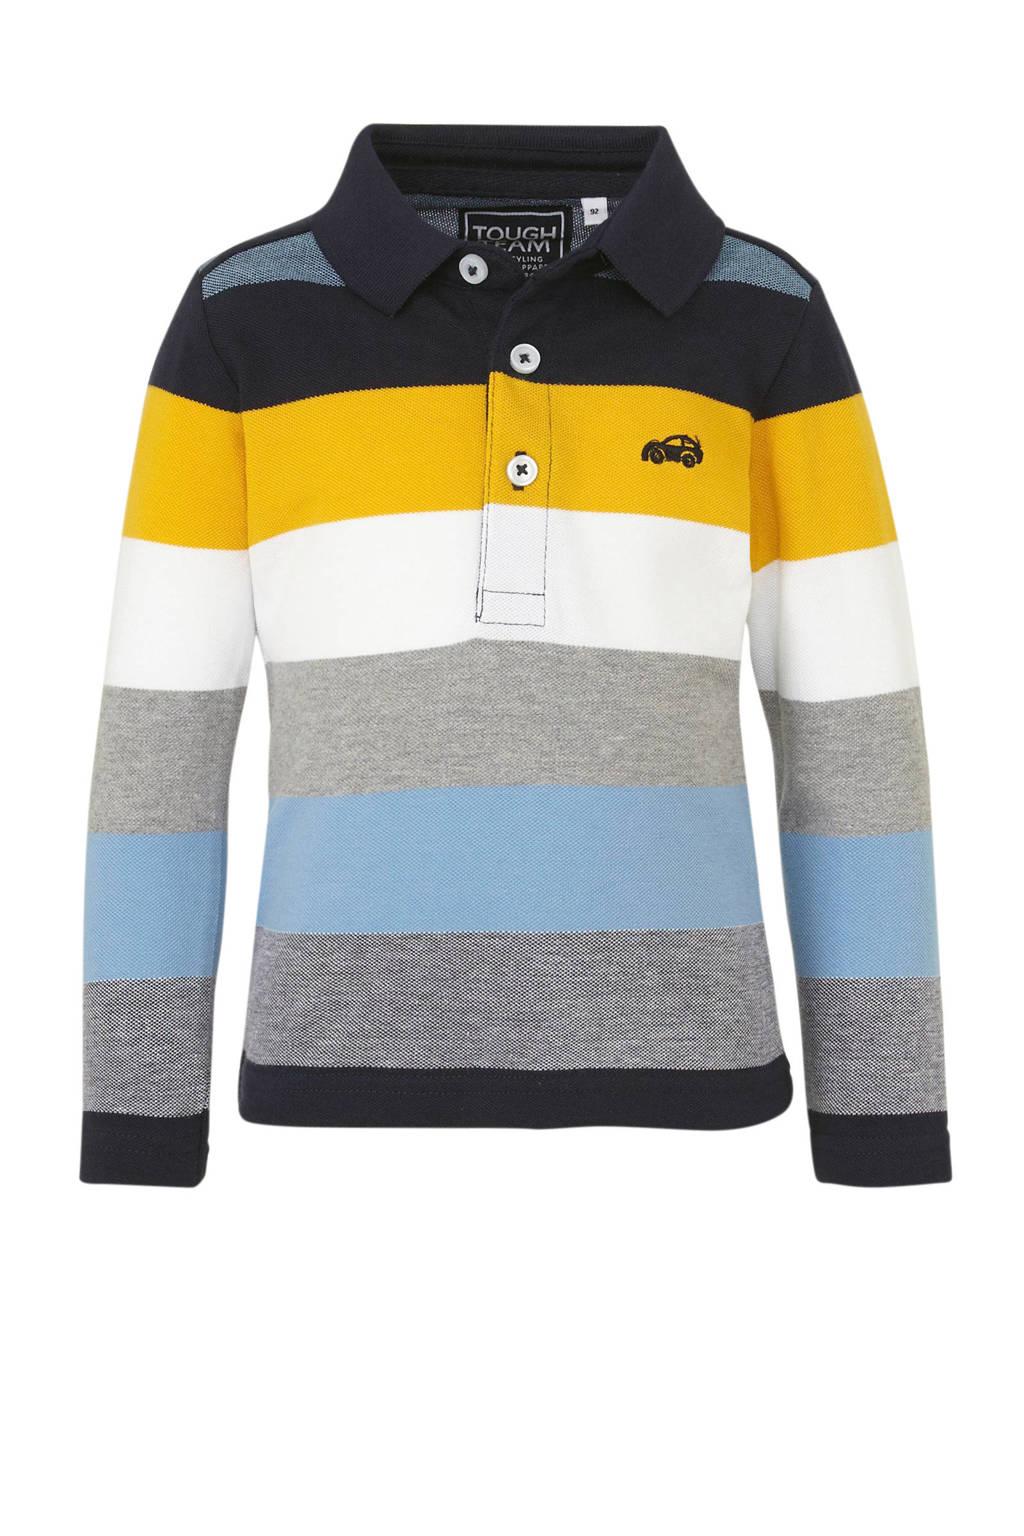 C&A Palomino gestreepte polo donkerblauw/grijs/geel, Donkerblauw/grijs/geel